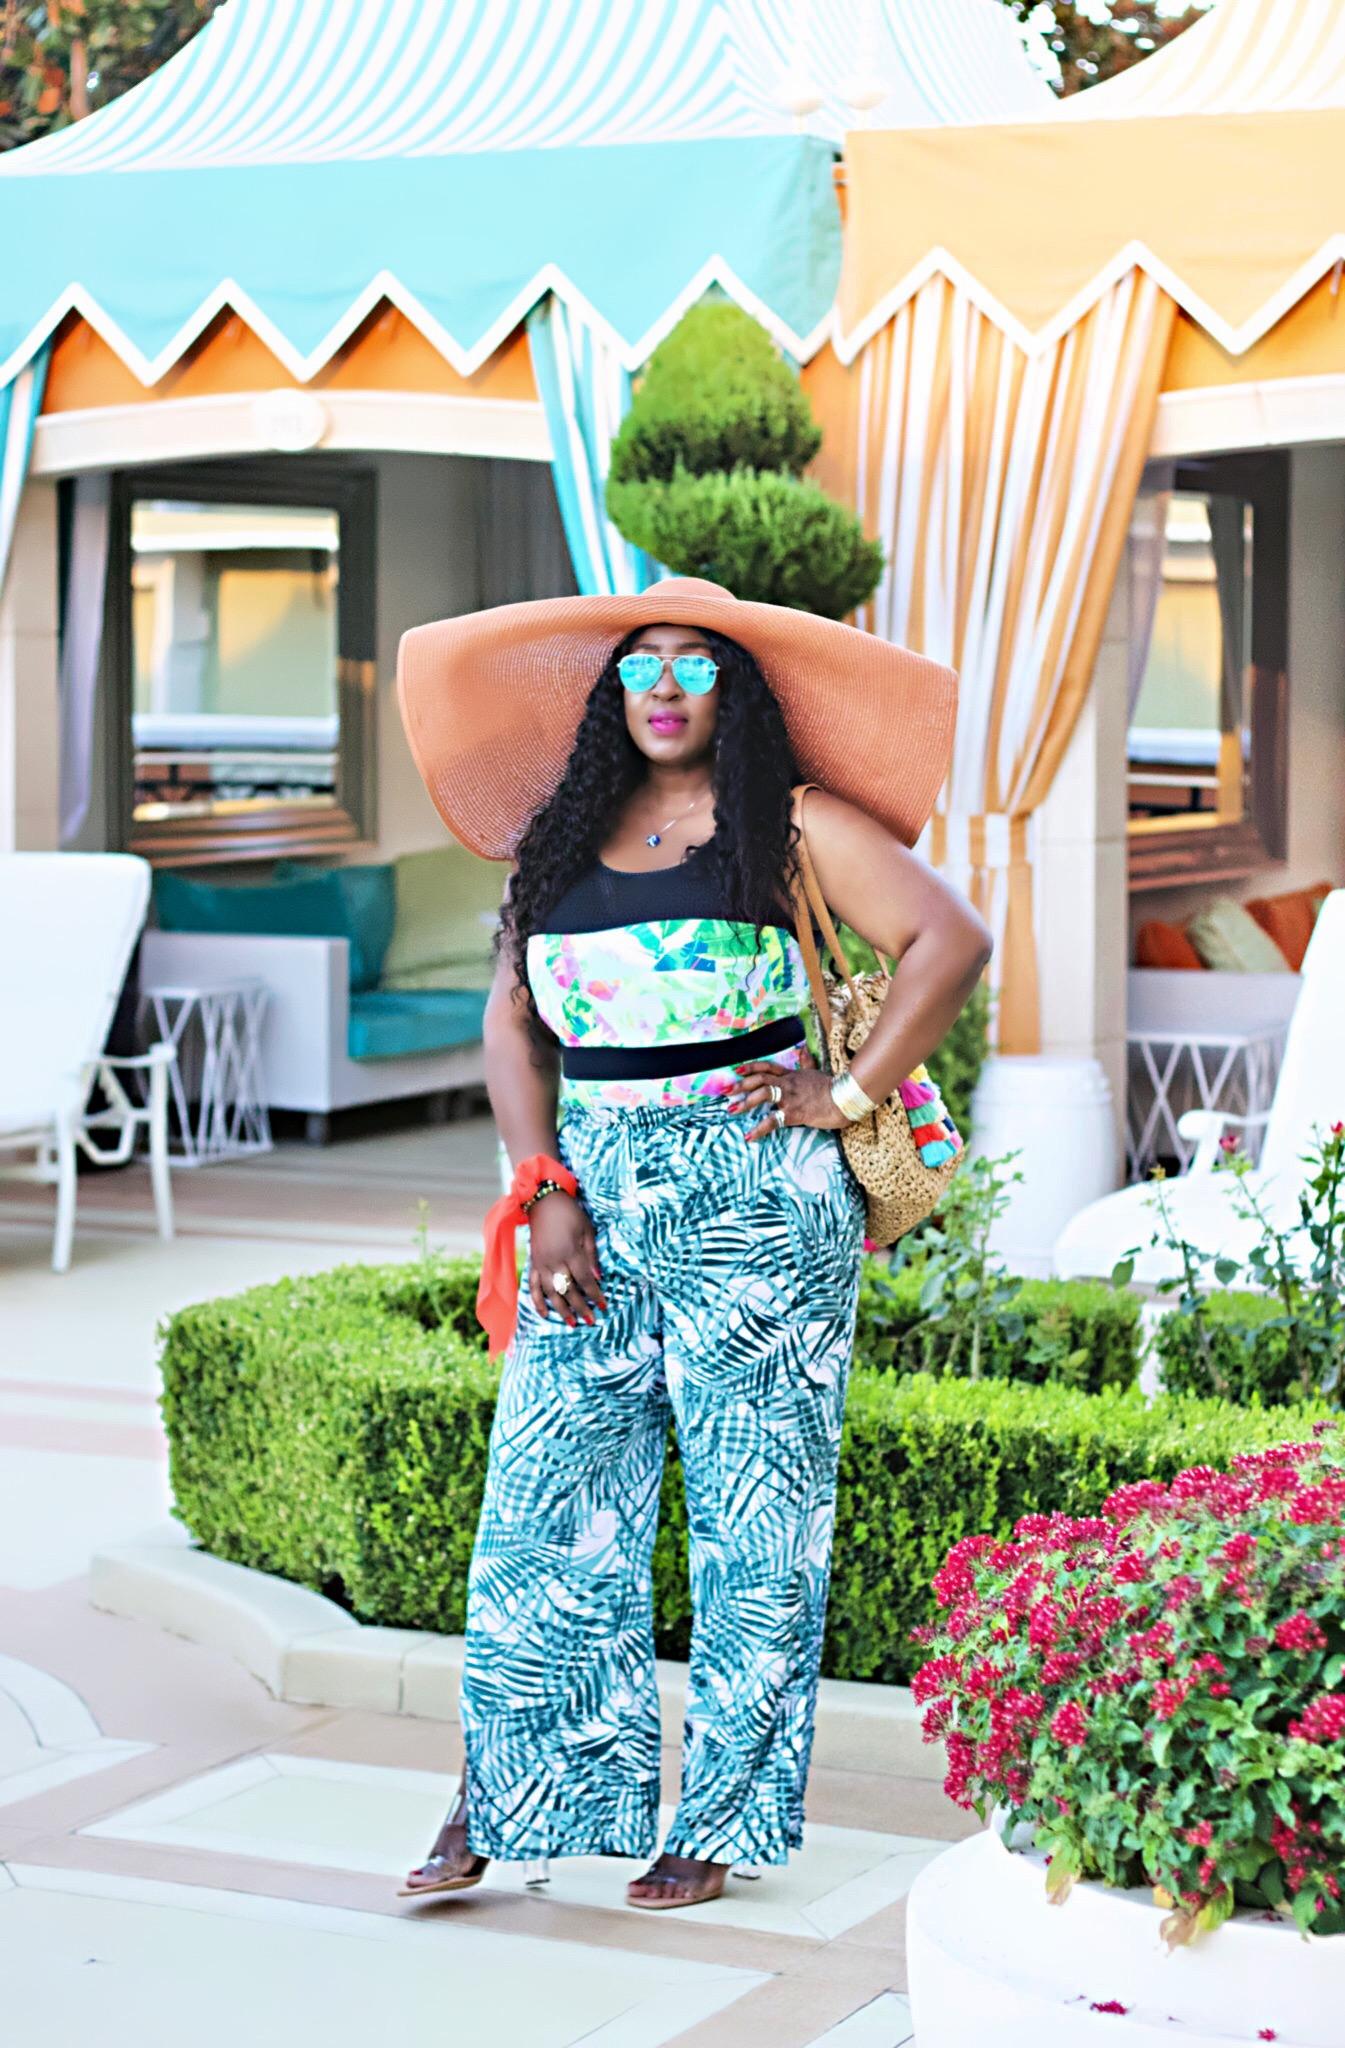 plus-size-fashion-blogger-influencer